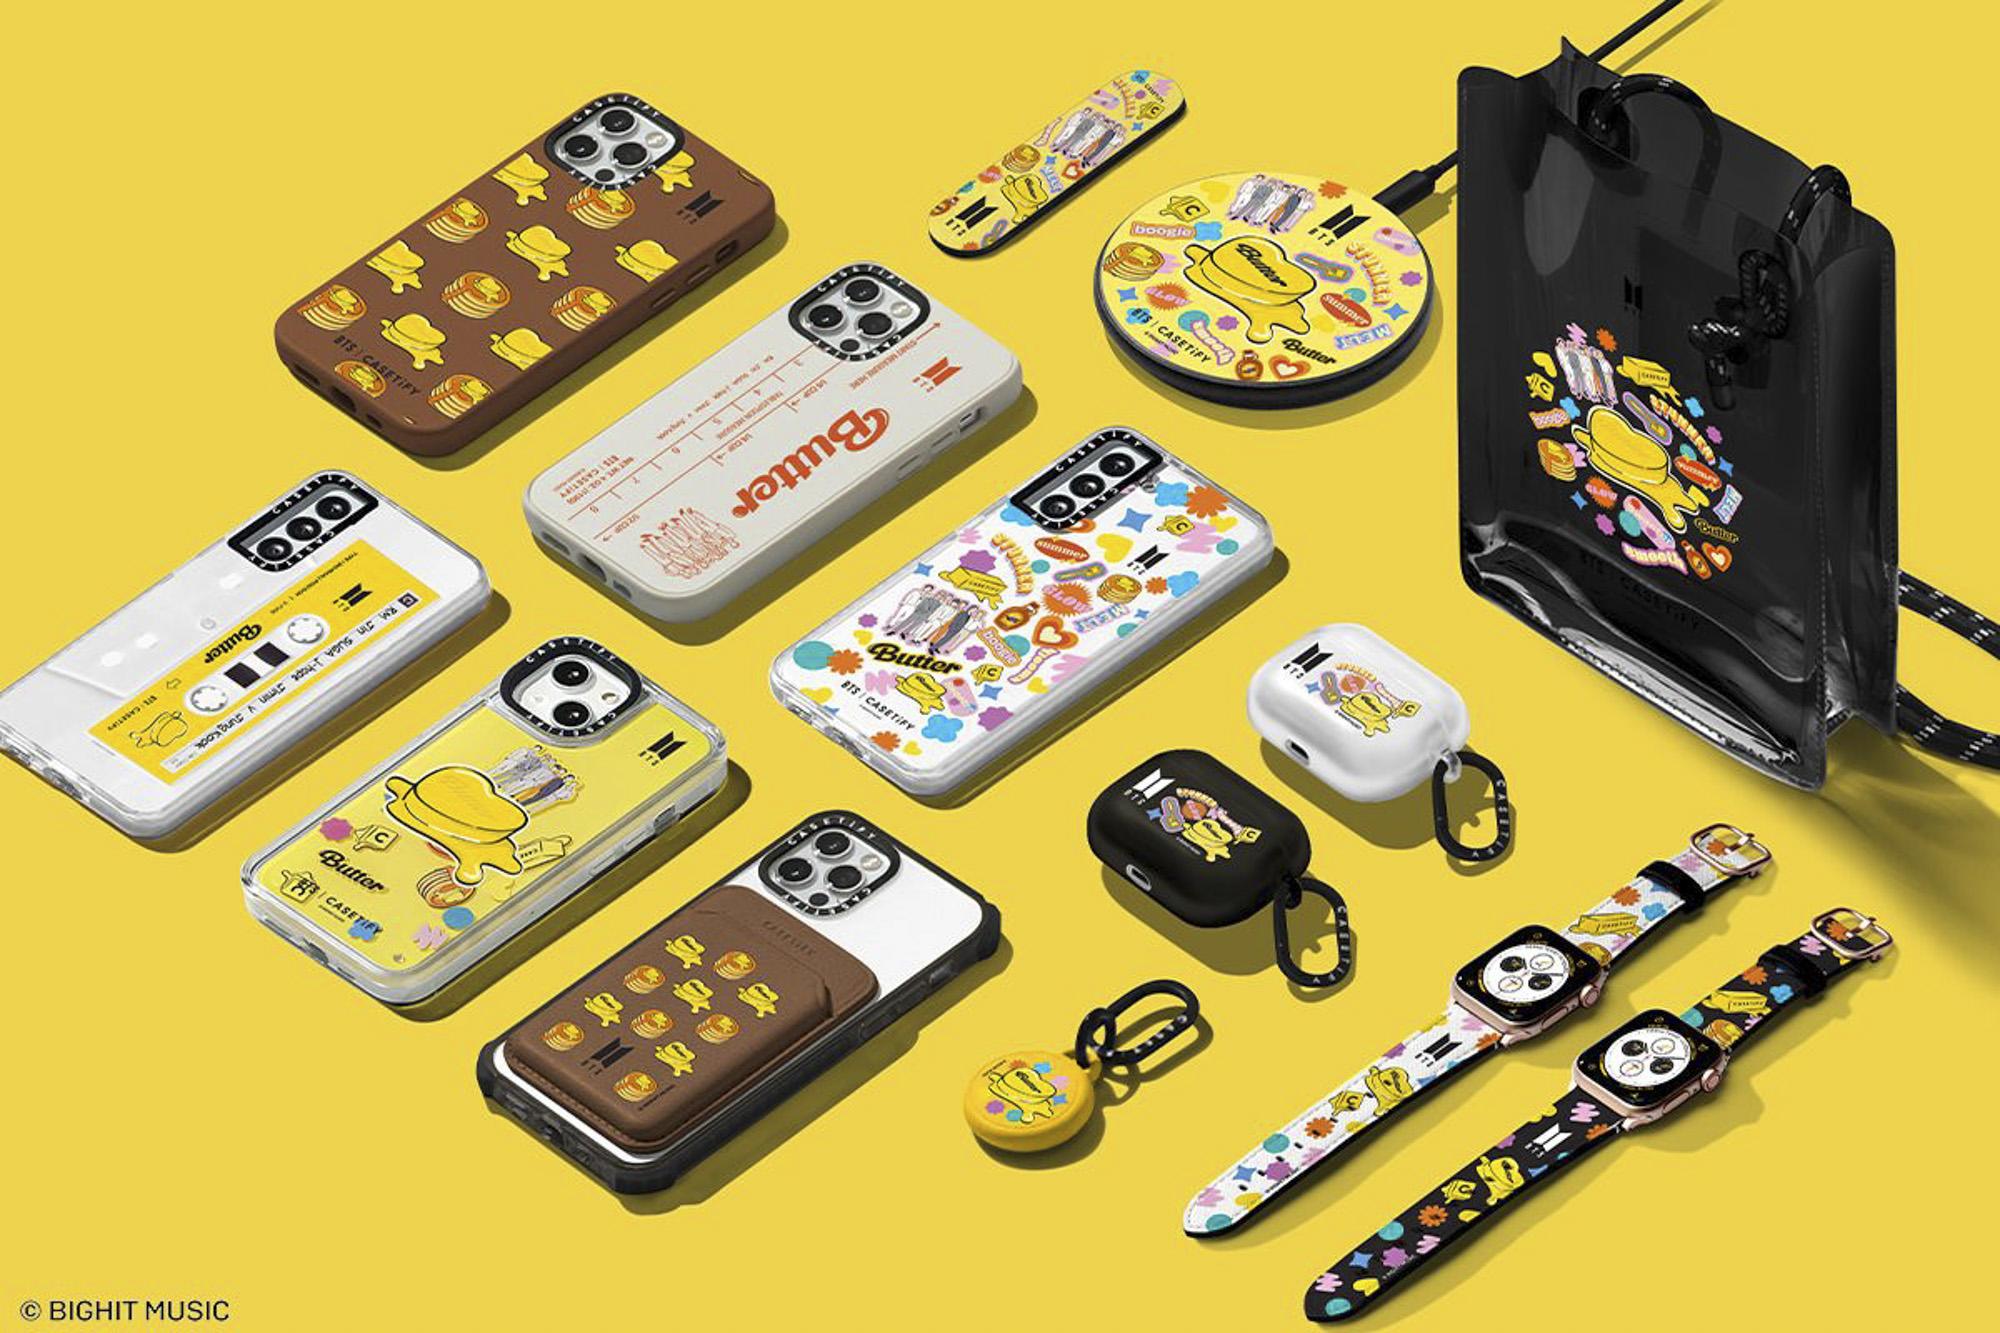 BTS Butter Case Merchandise